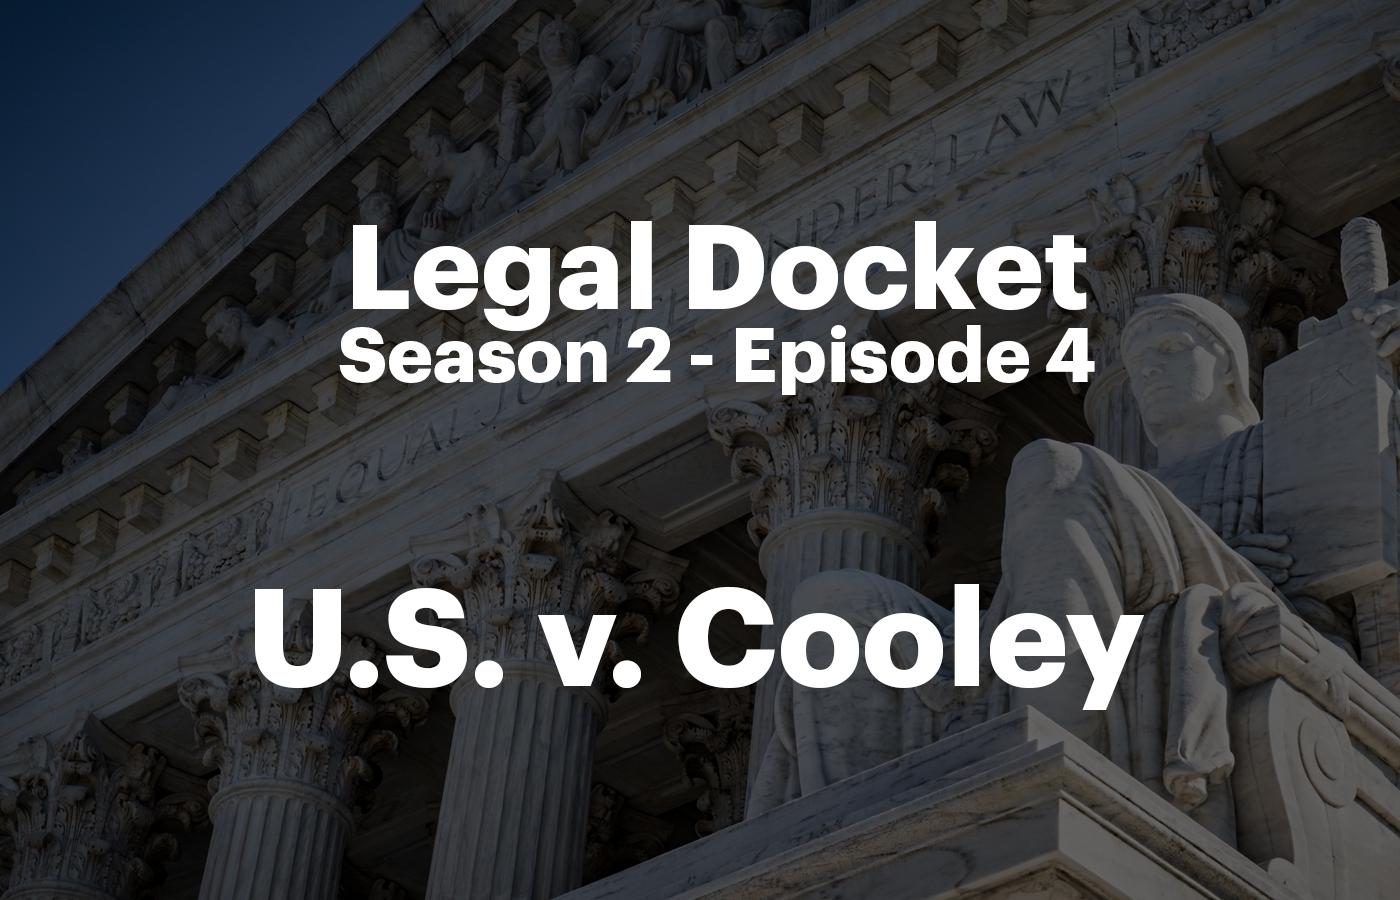 Legal Docket S2 E4